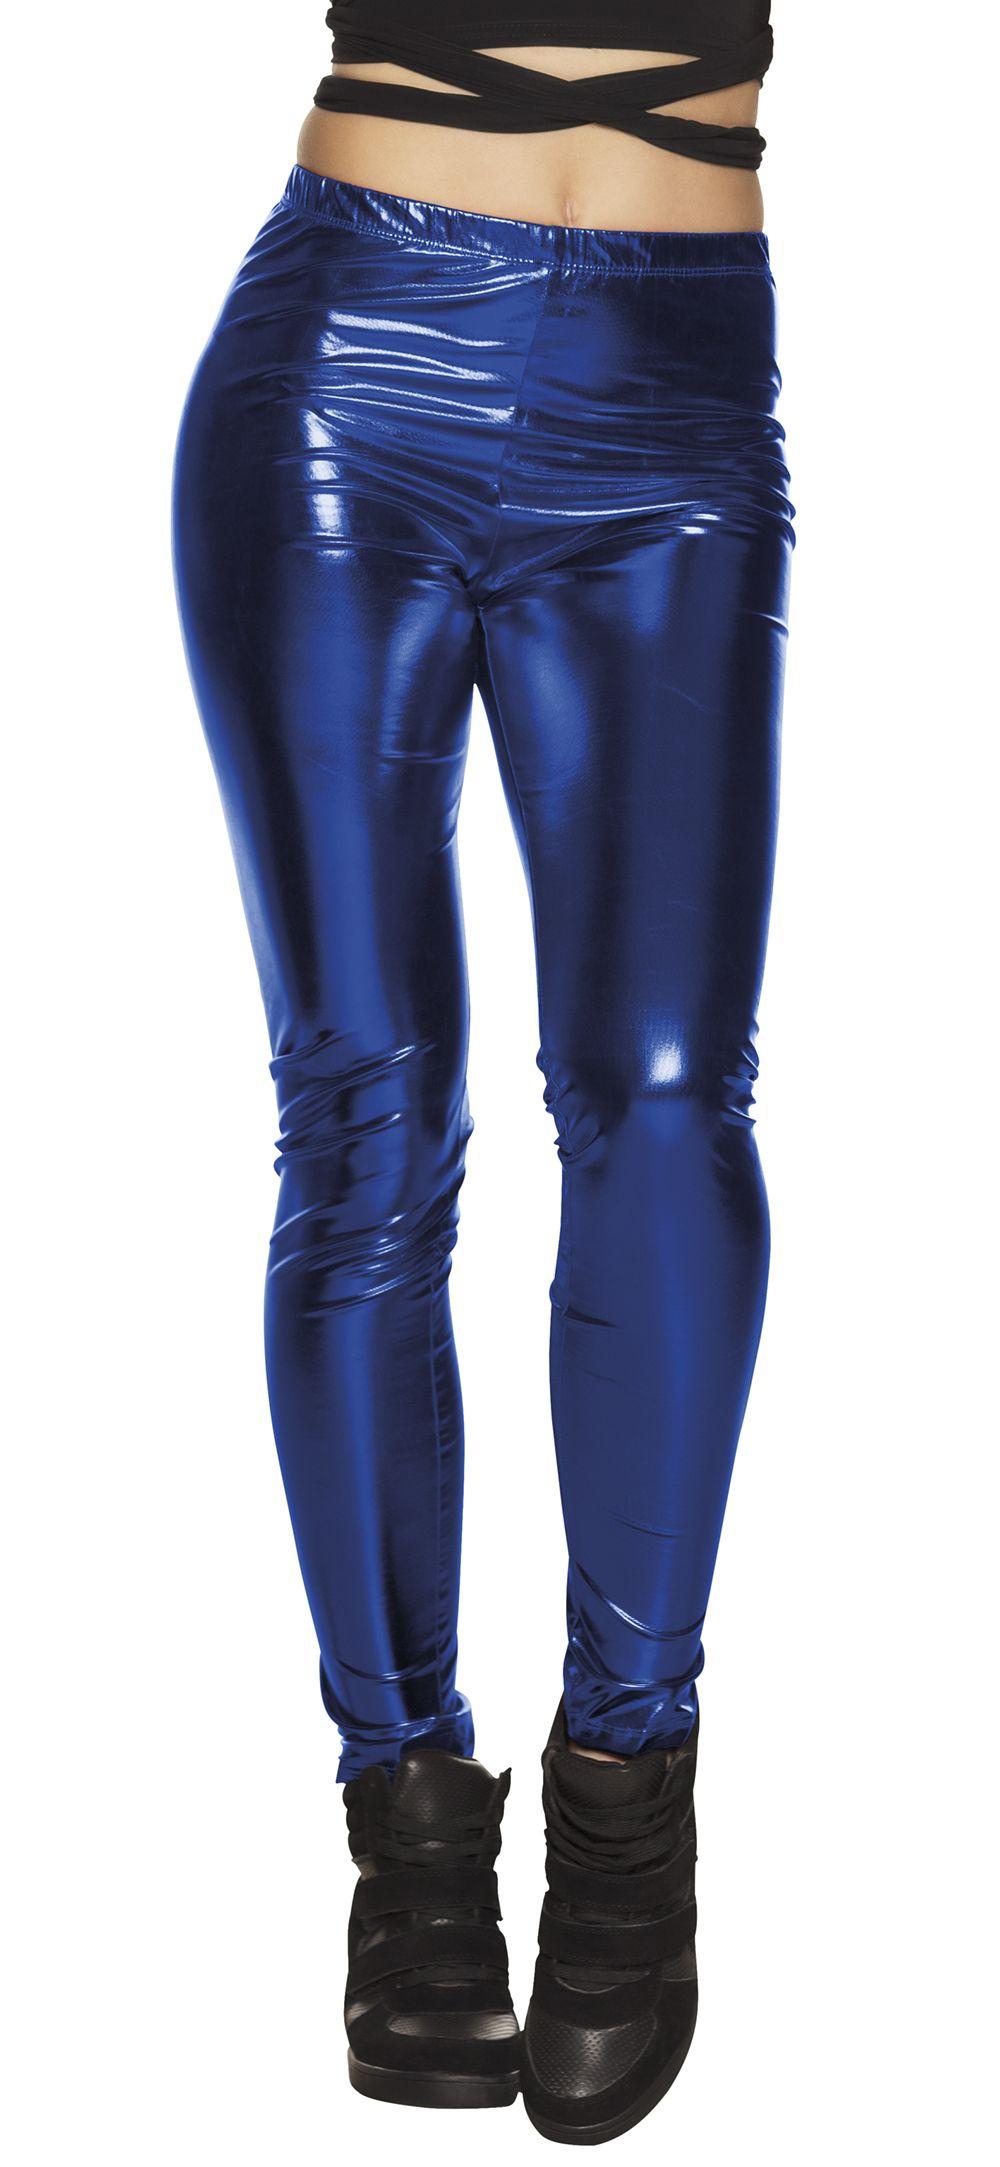 Legging Glance blauw stretch one size (M)